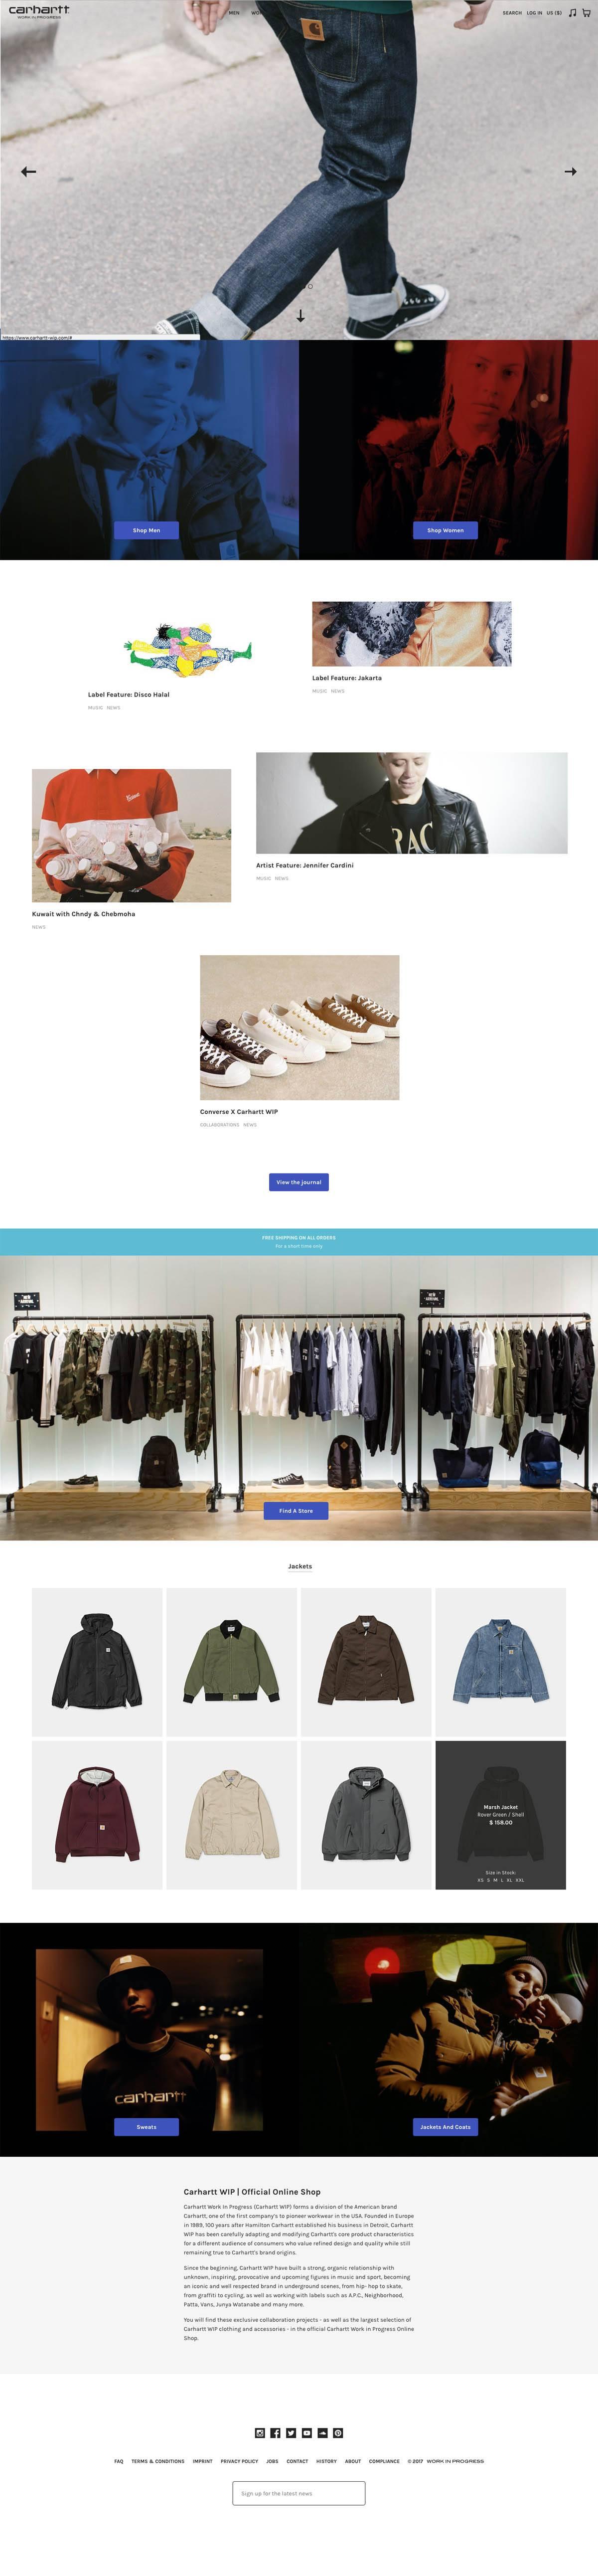 eCommerce website: carhartt